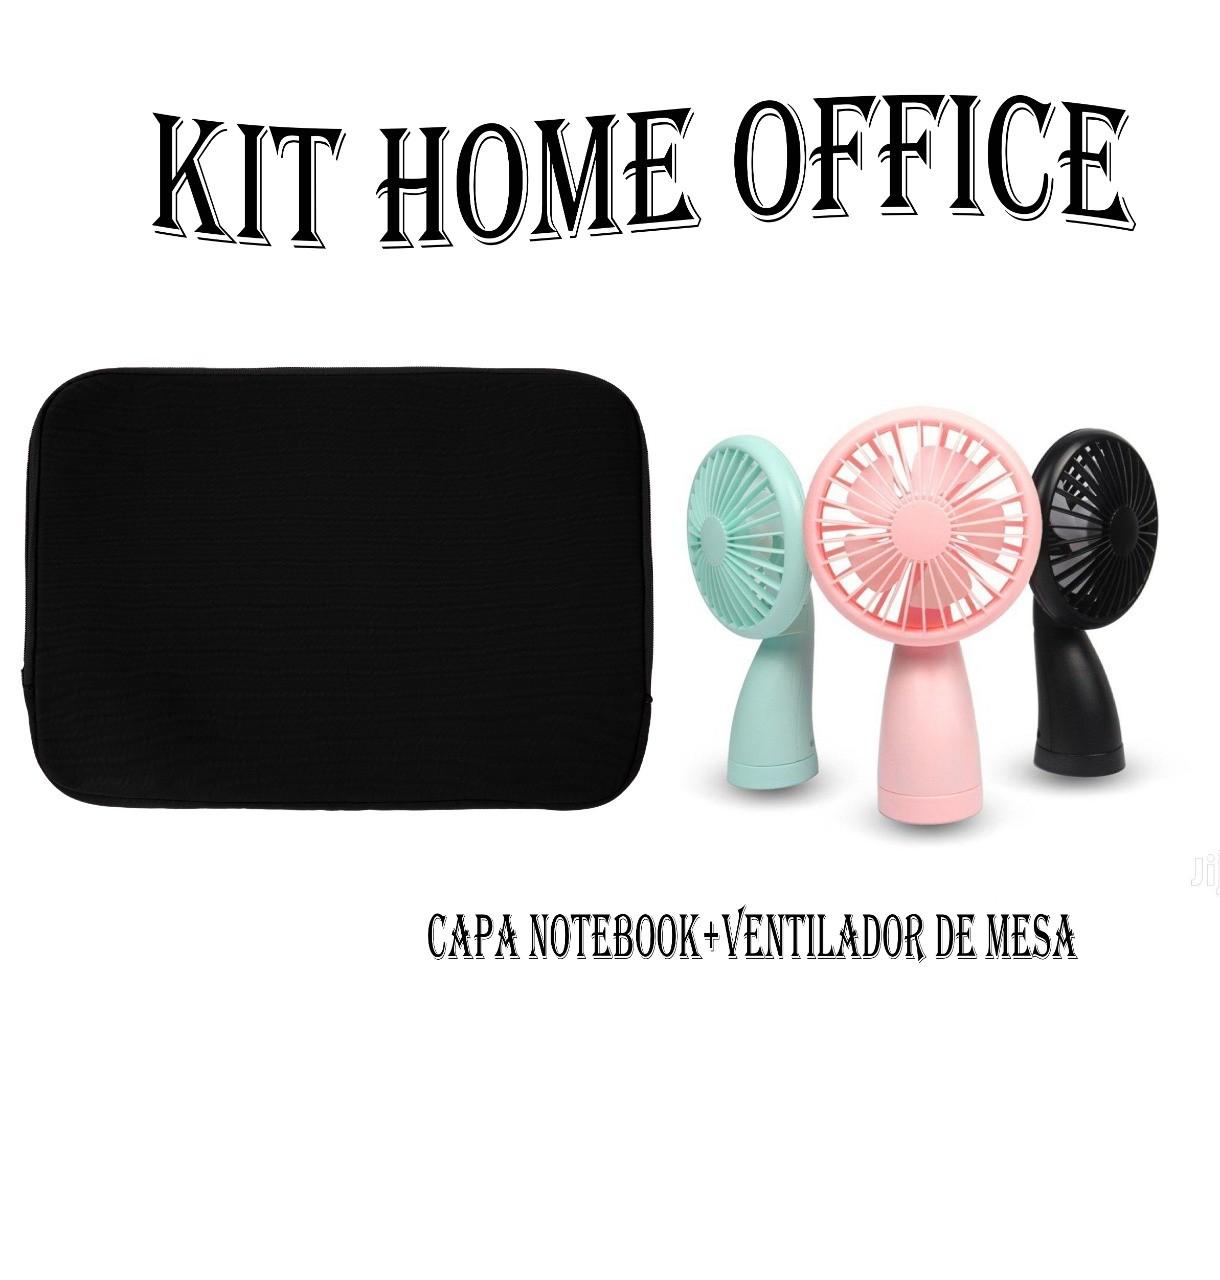 Kit Home Office Capa Para Notebook E Mini Ventilador  -  Mothelucci Loja online